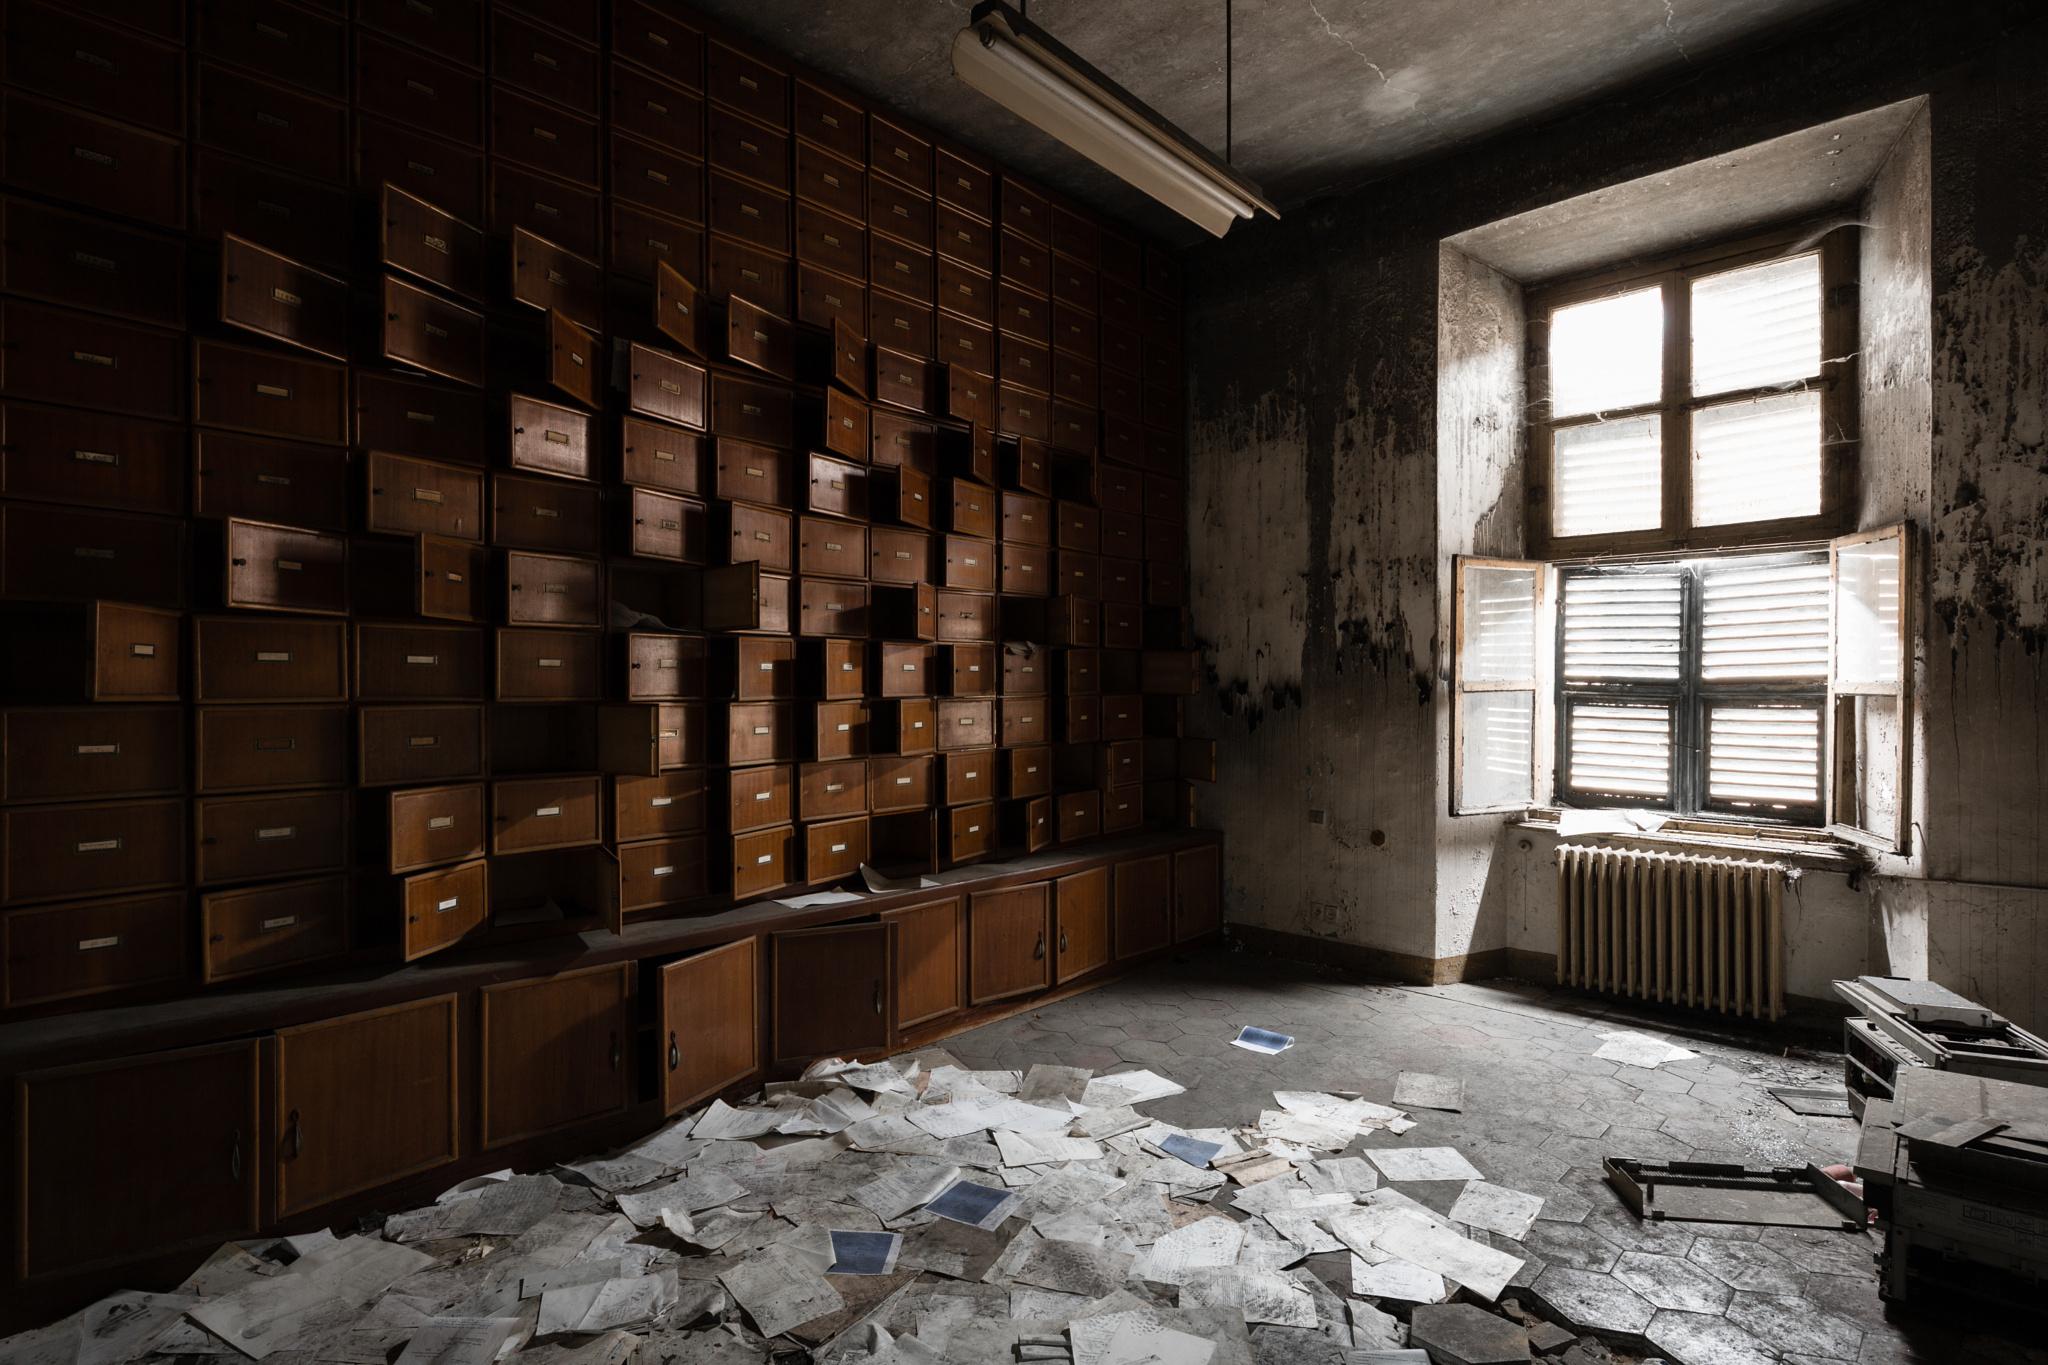 Abandoned psychiatric hospital 04